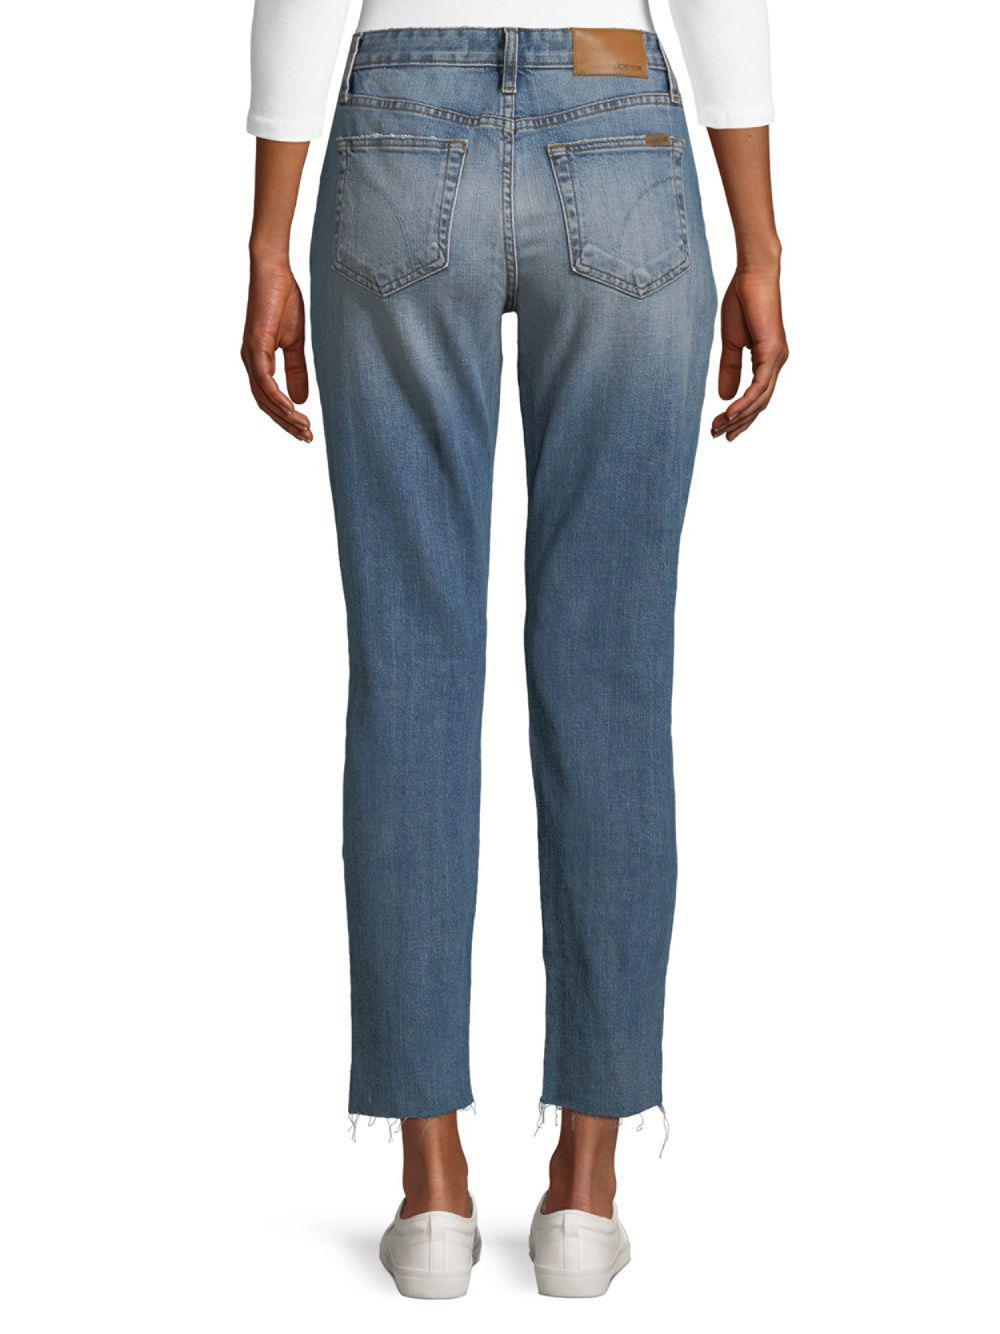 Joe's Jeans Denim High Rise Ankle Jeans in Cooper (Blue)